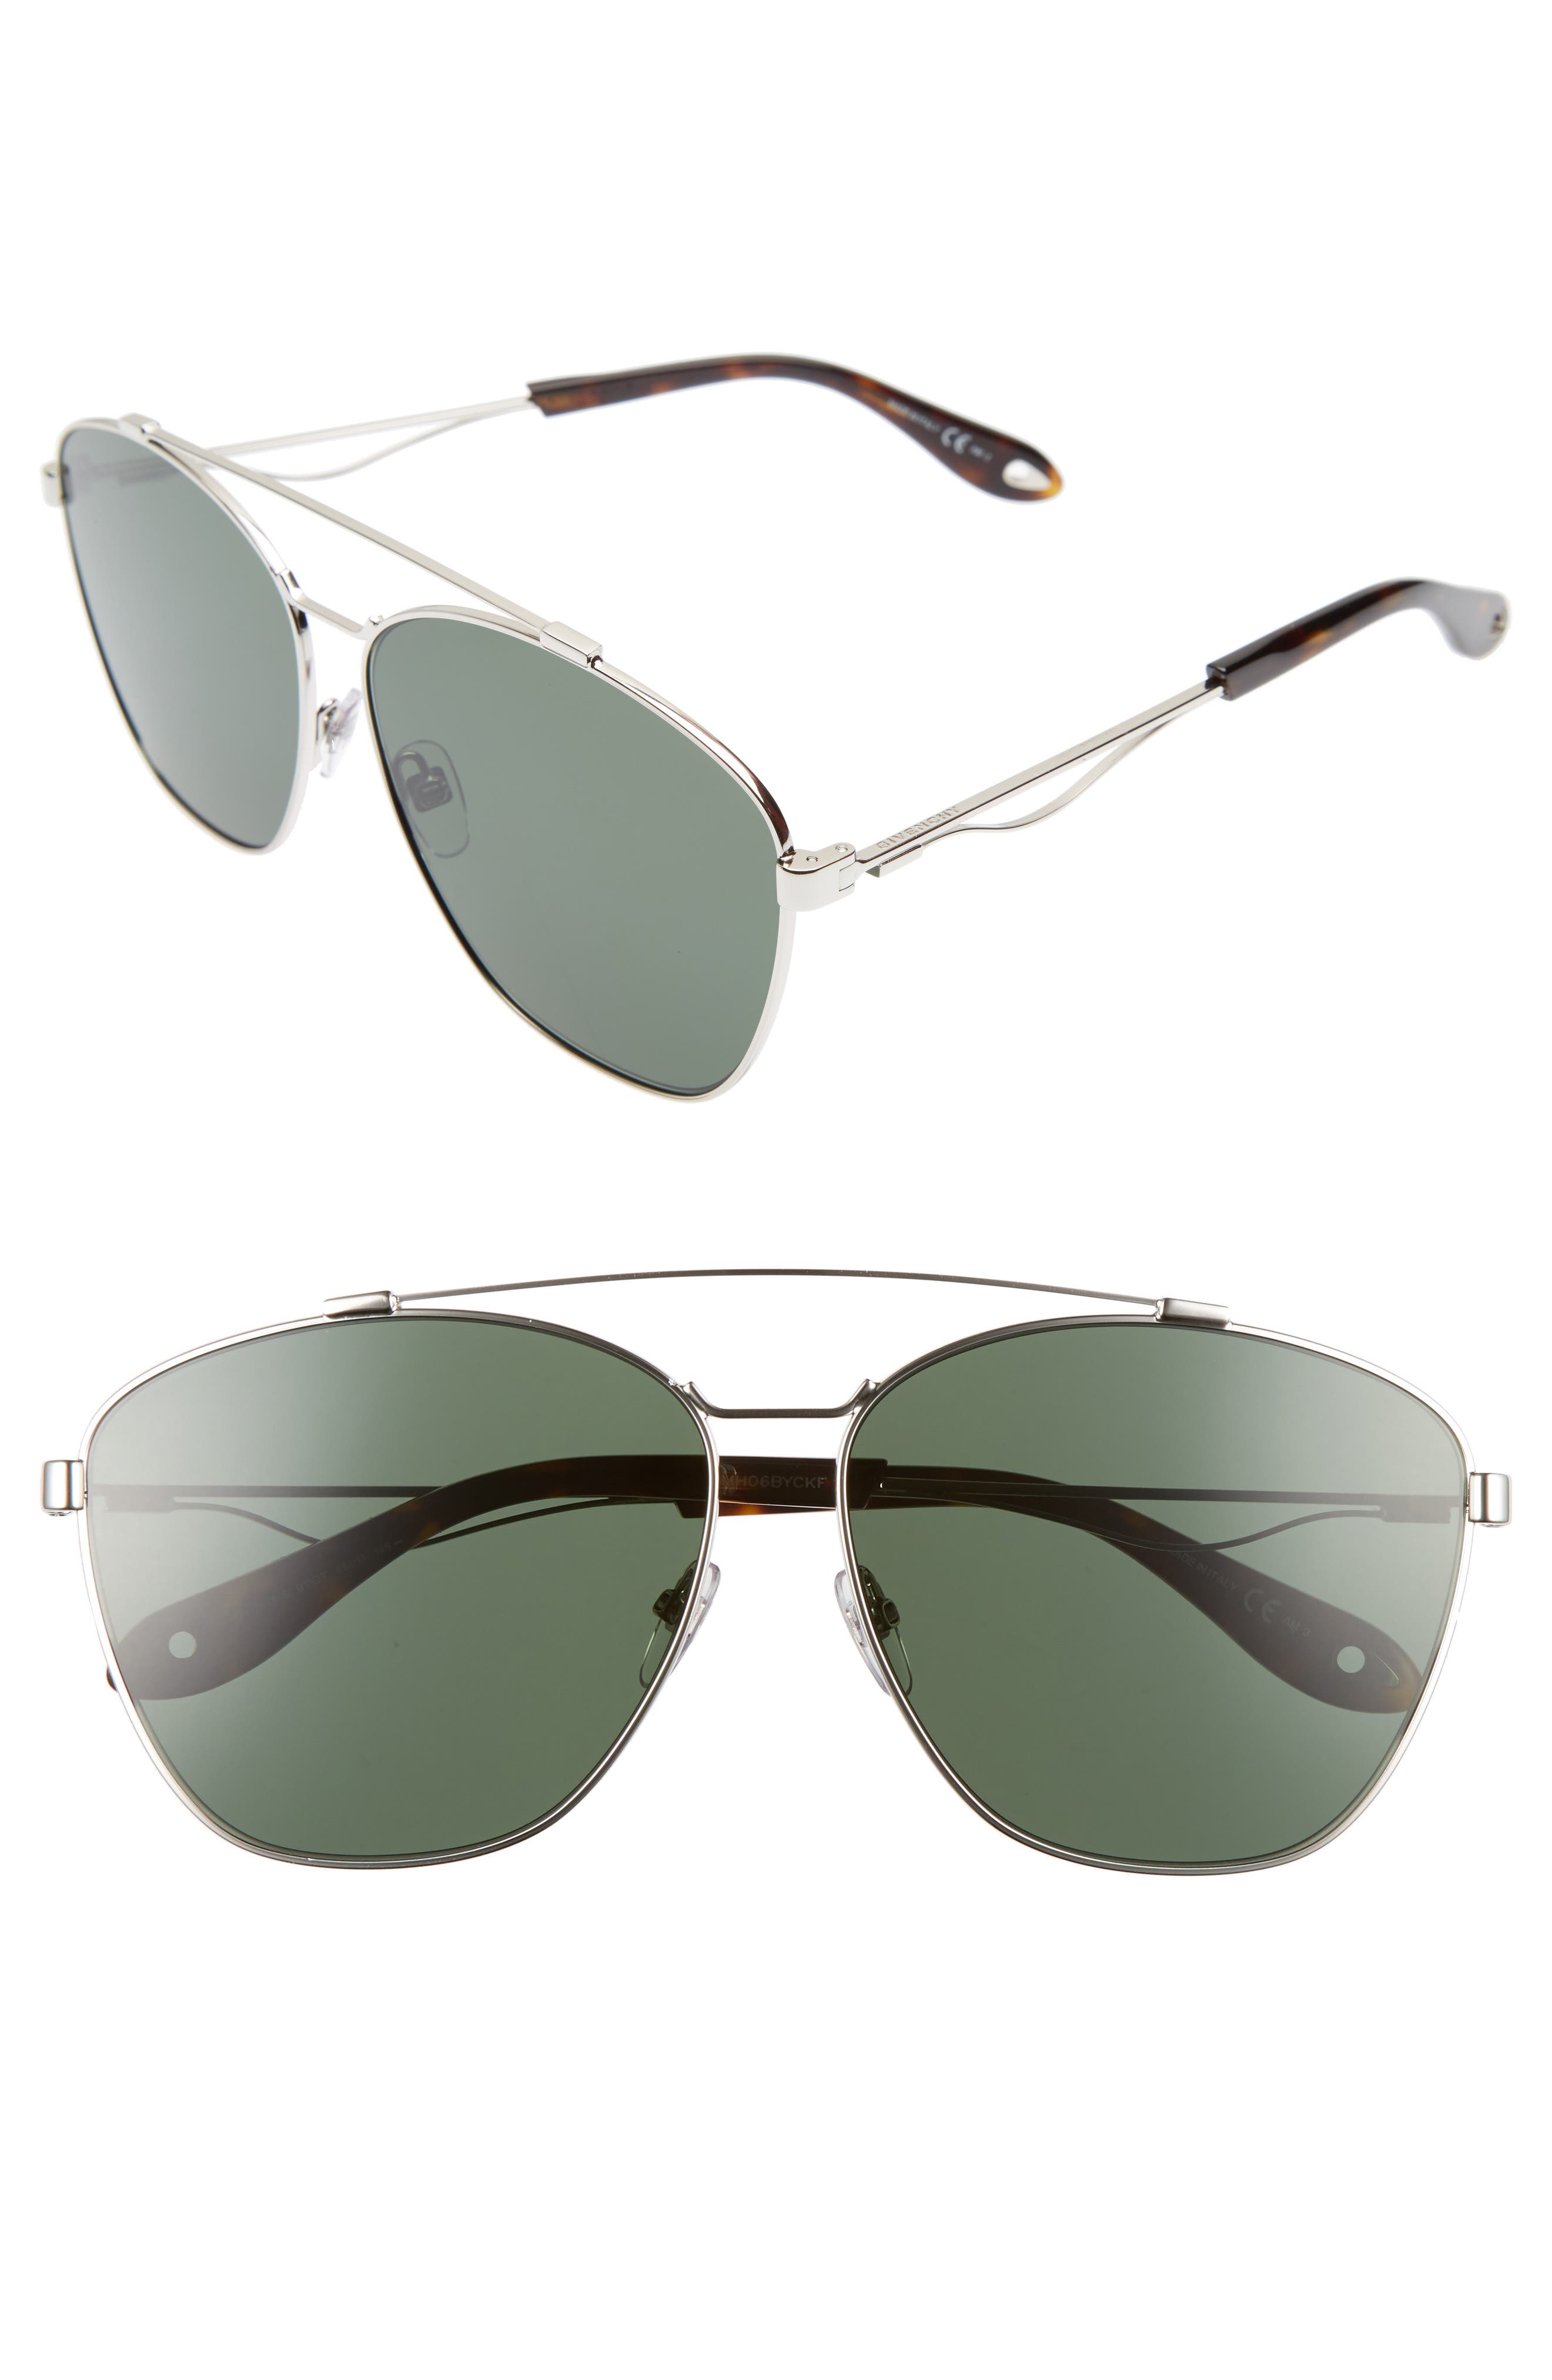 65mm Round Aviator Sunglasses,                             Main thumbnail 1, color,                             Palladium